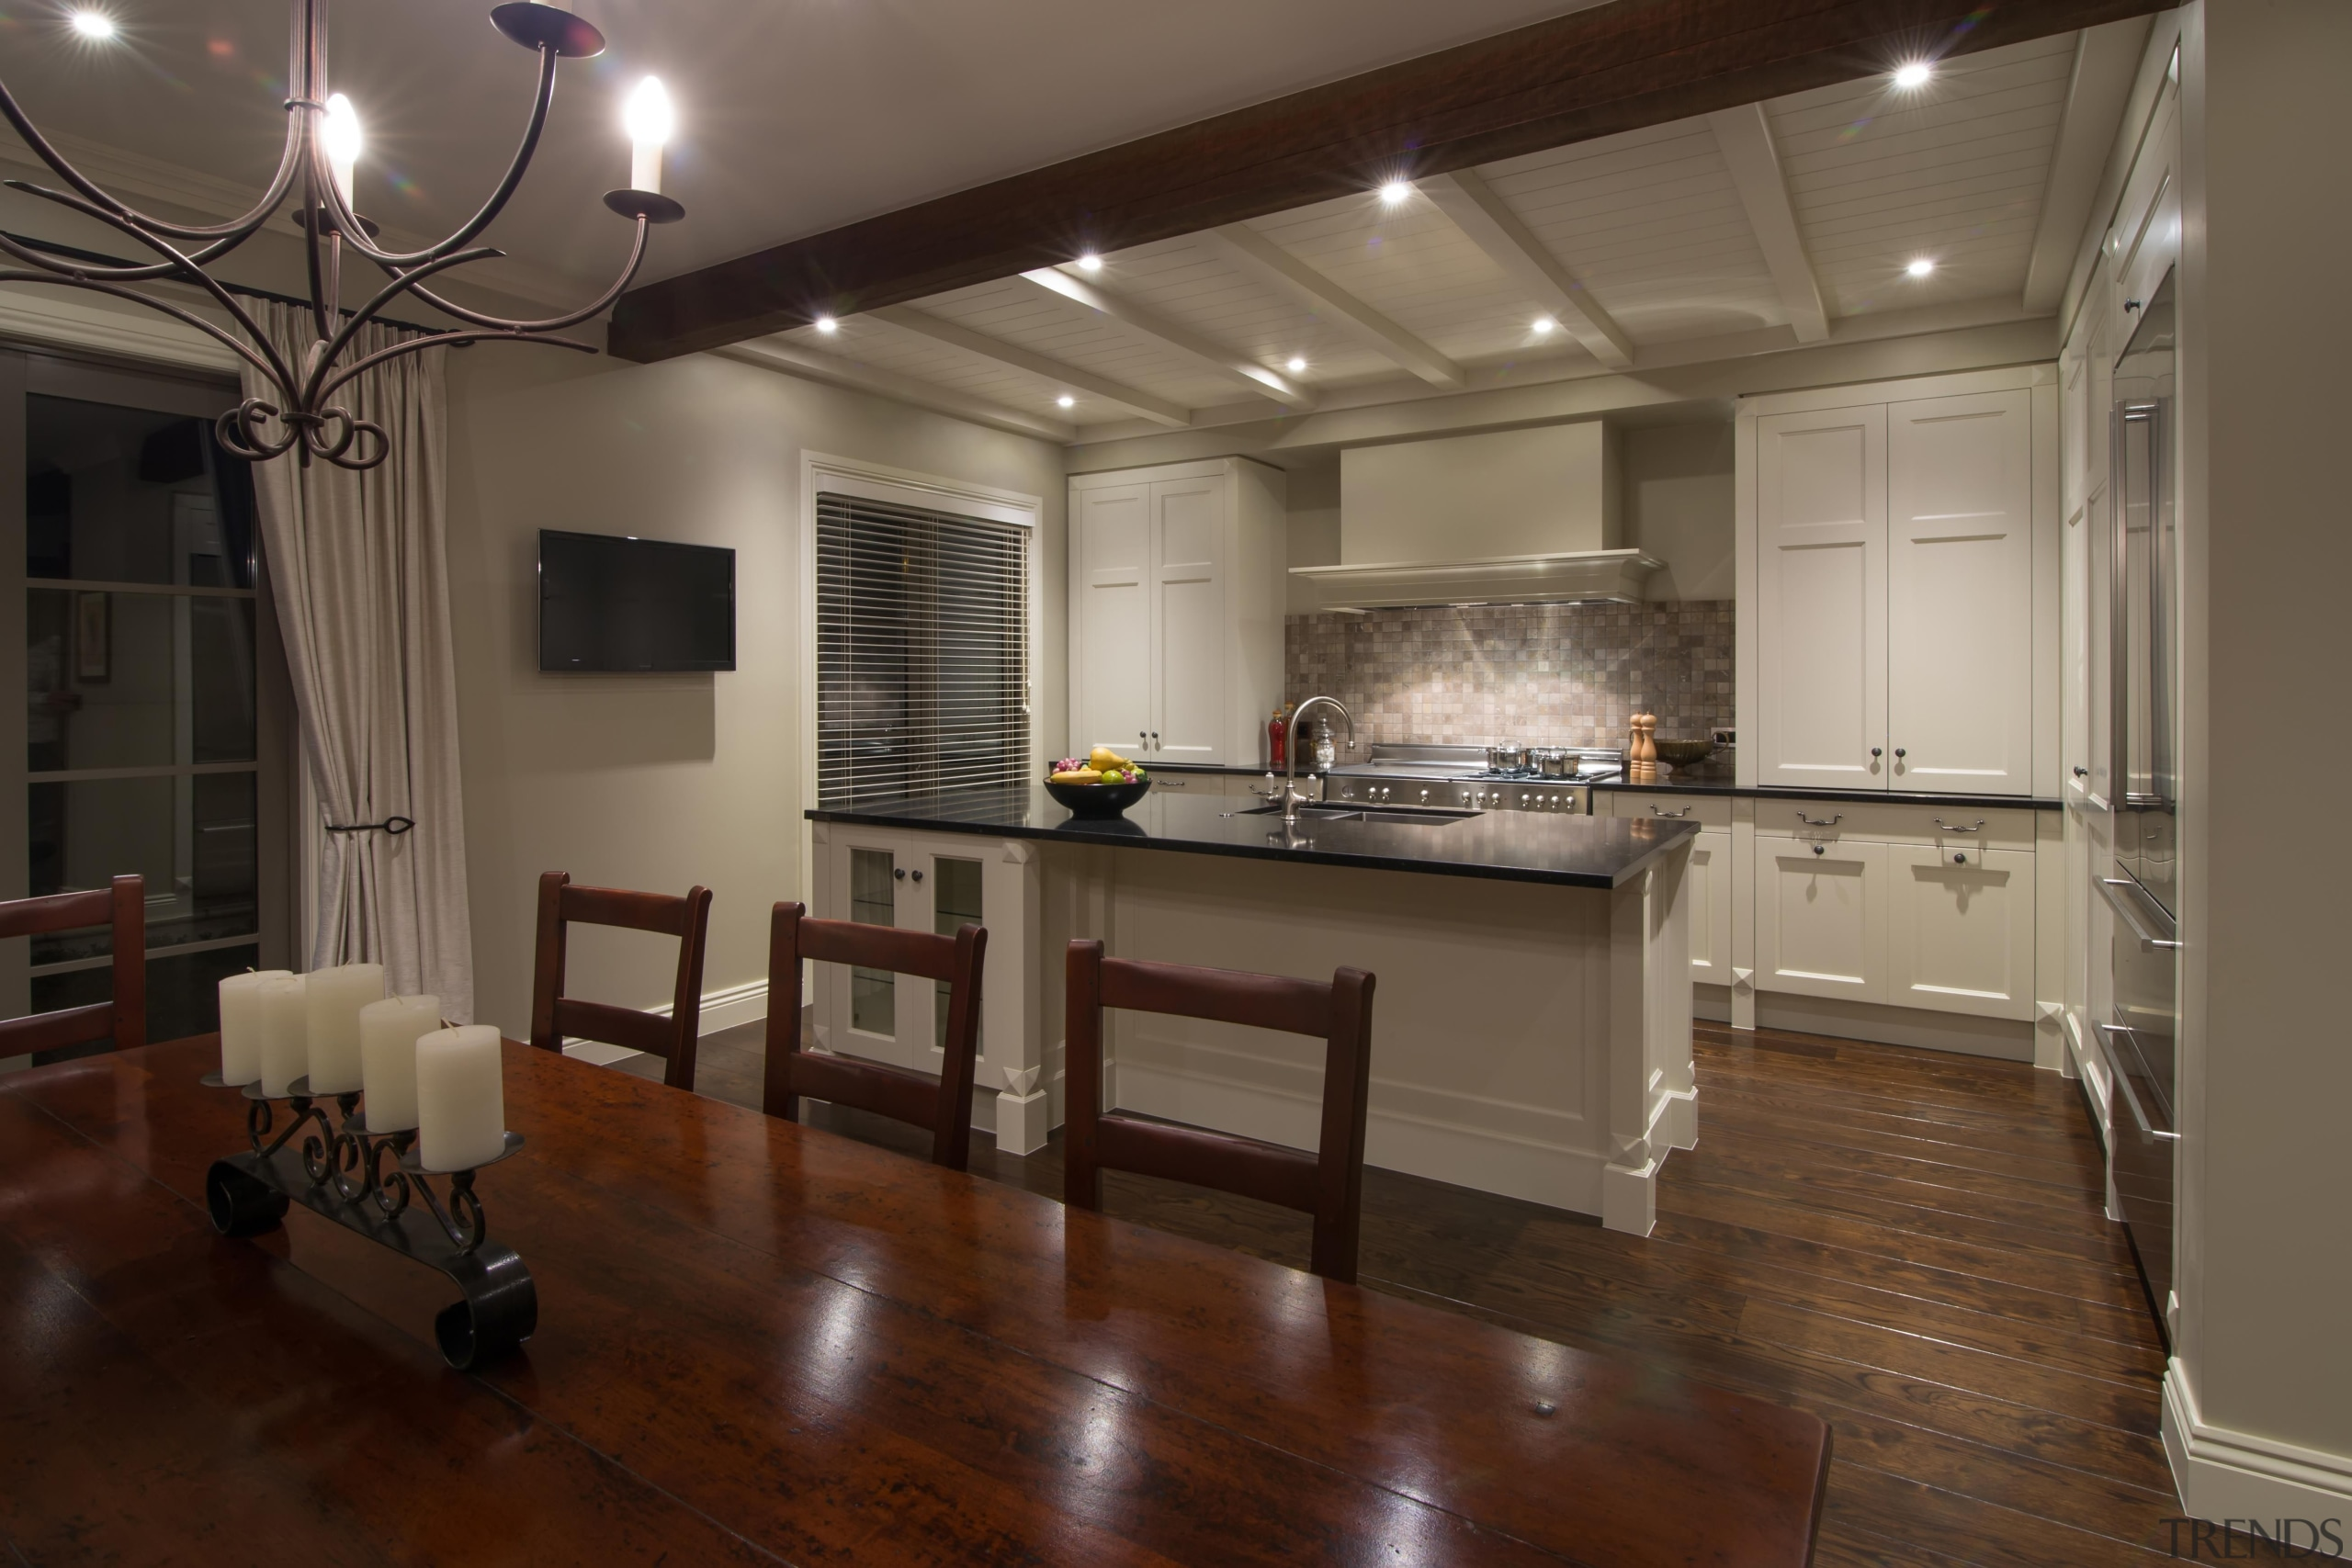 Img3536 - ceiling | countertop | floor | ceiling, countertop, floor, flooring, hardwood, interior design, kitchen, real estate, room, wood flooring, brown